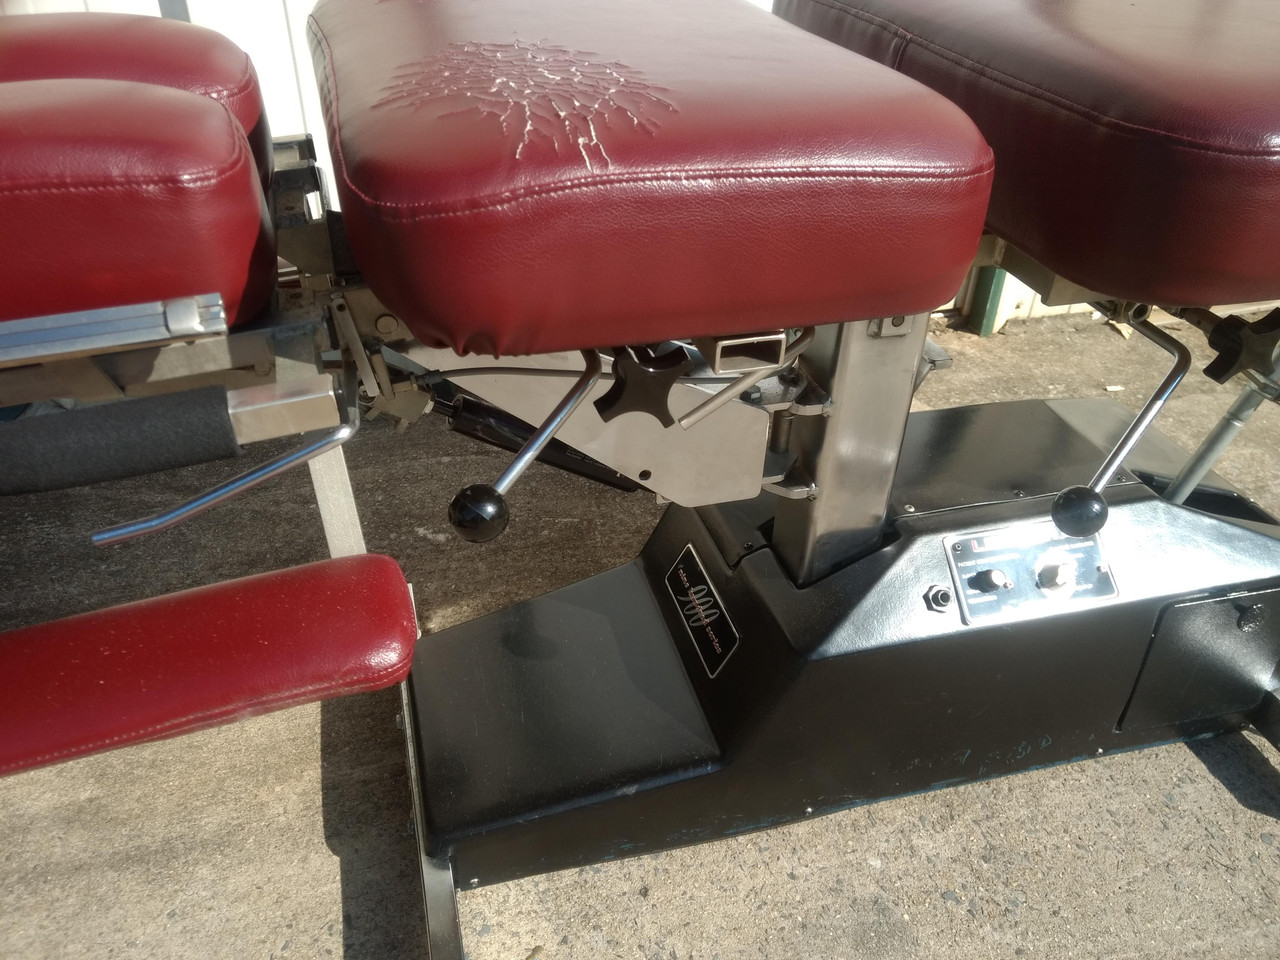 Used Leander 950 Auto Flexion Elevation Table